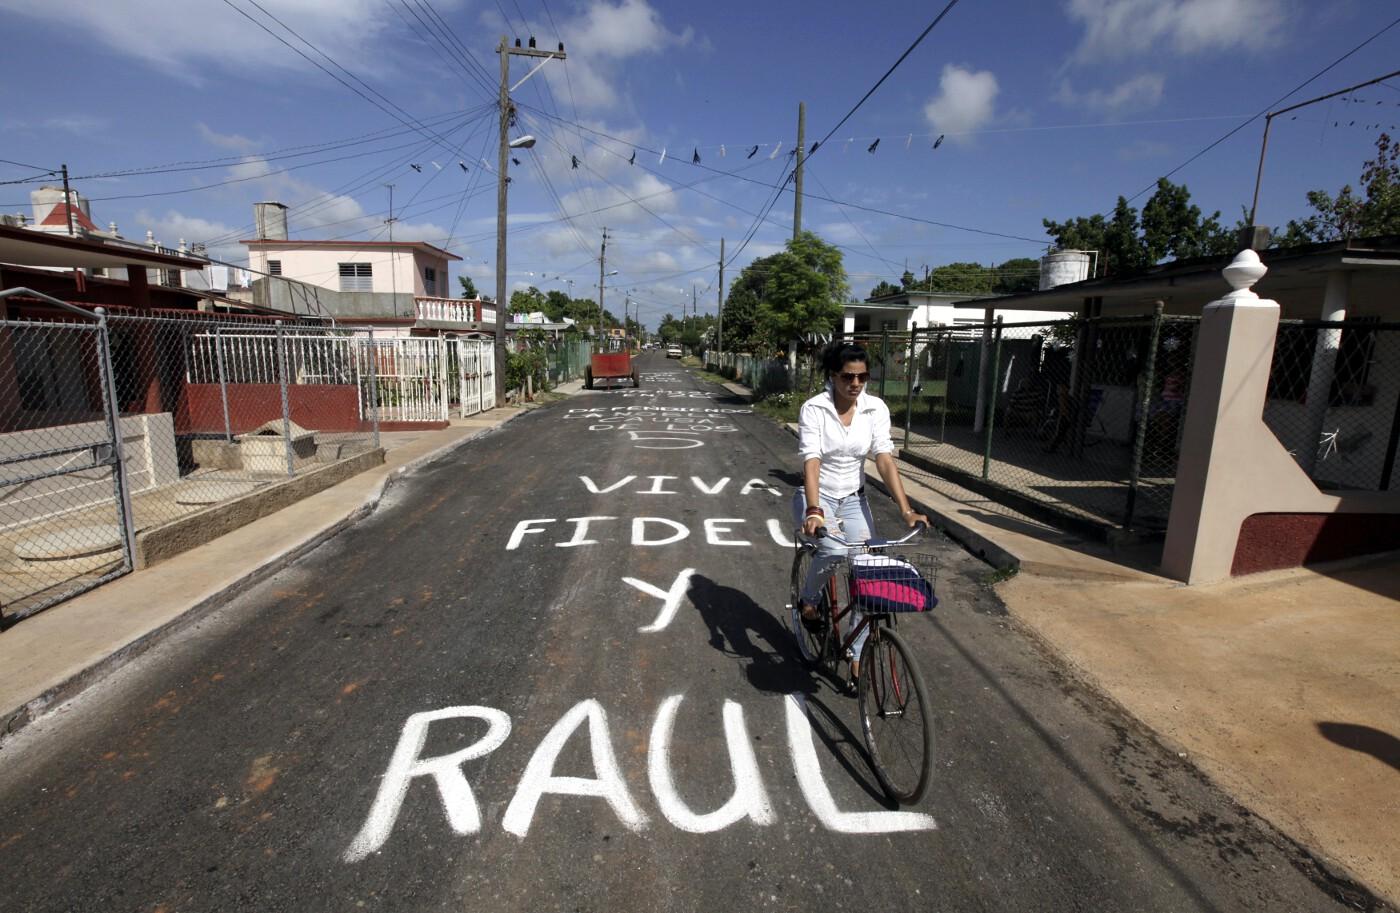 Life in Cuba 1